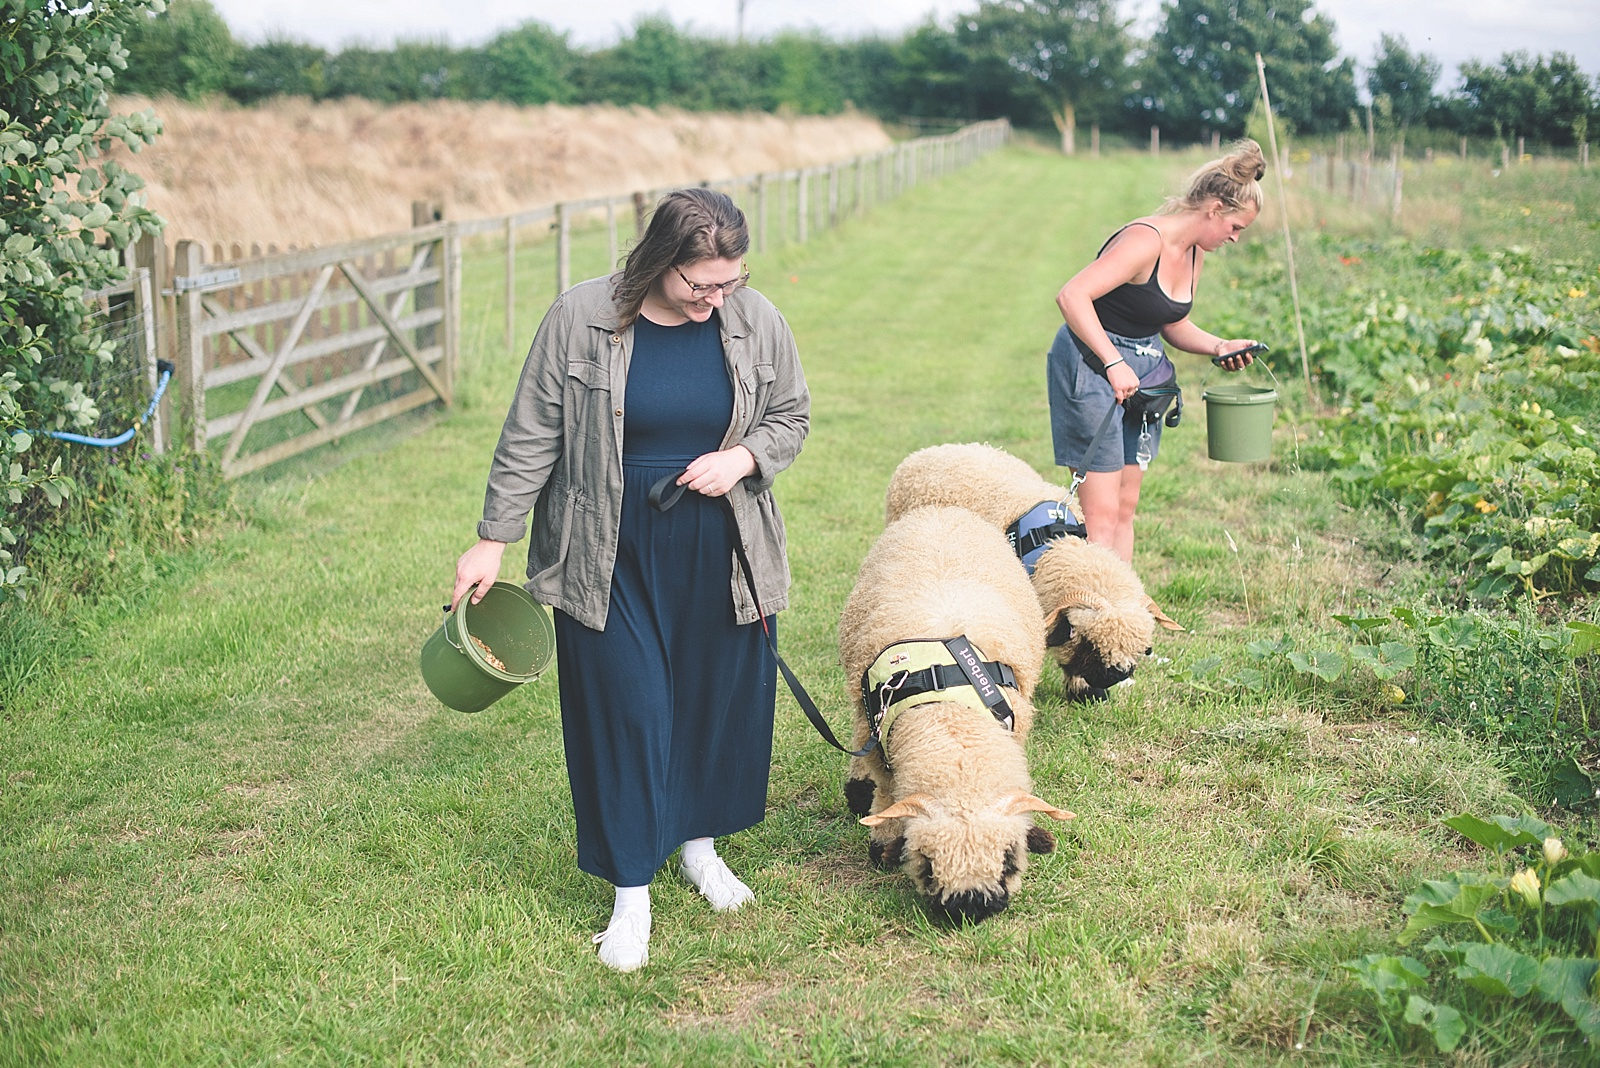 Valais Blacknose Sheep Walking Experience at The Sunshine Farm in Northampton England